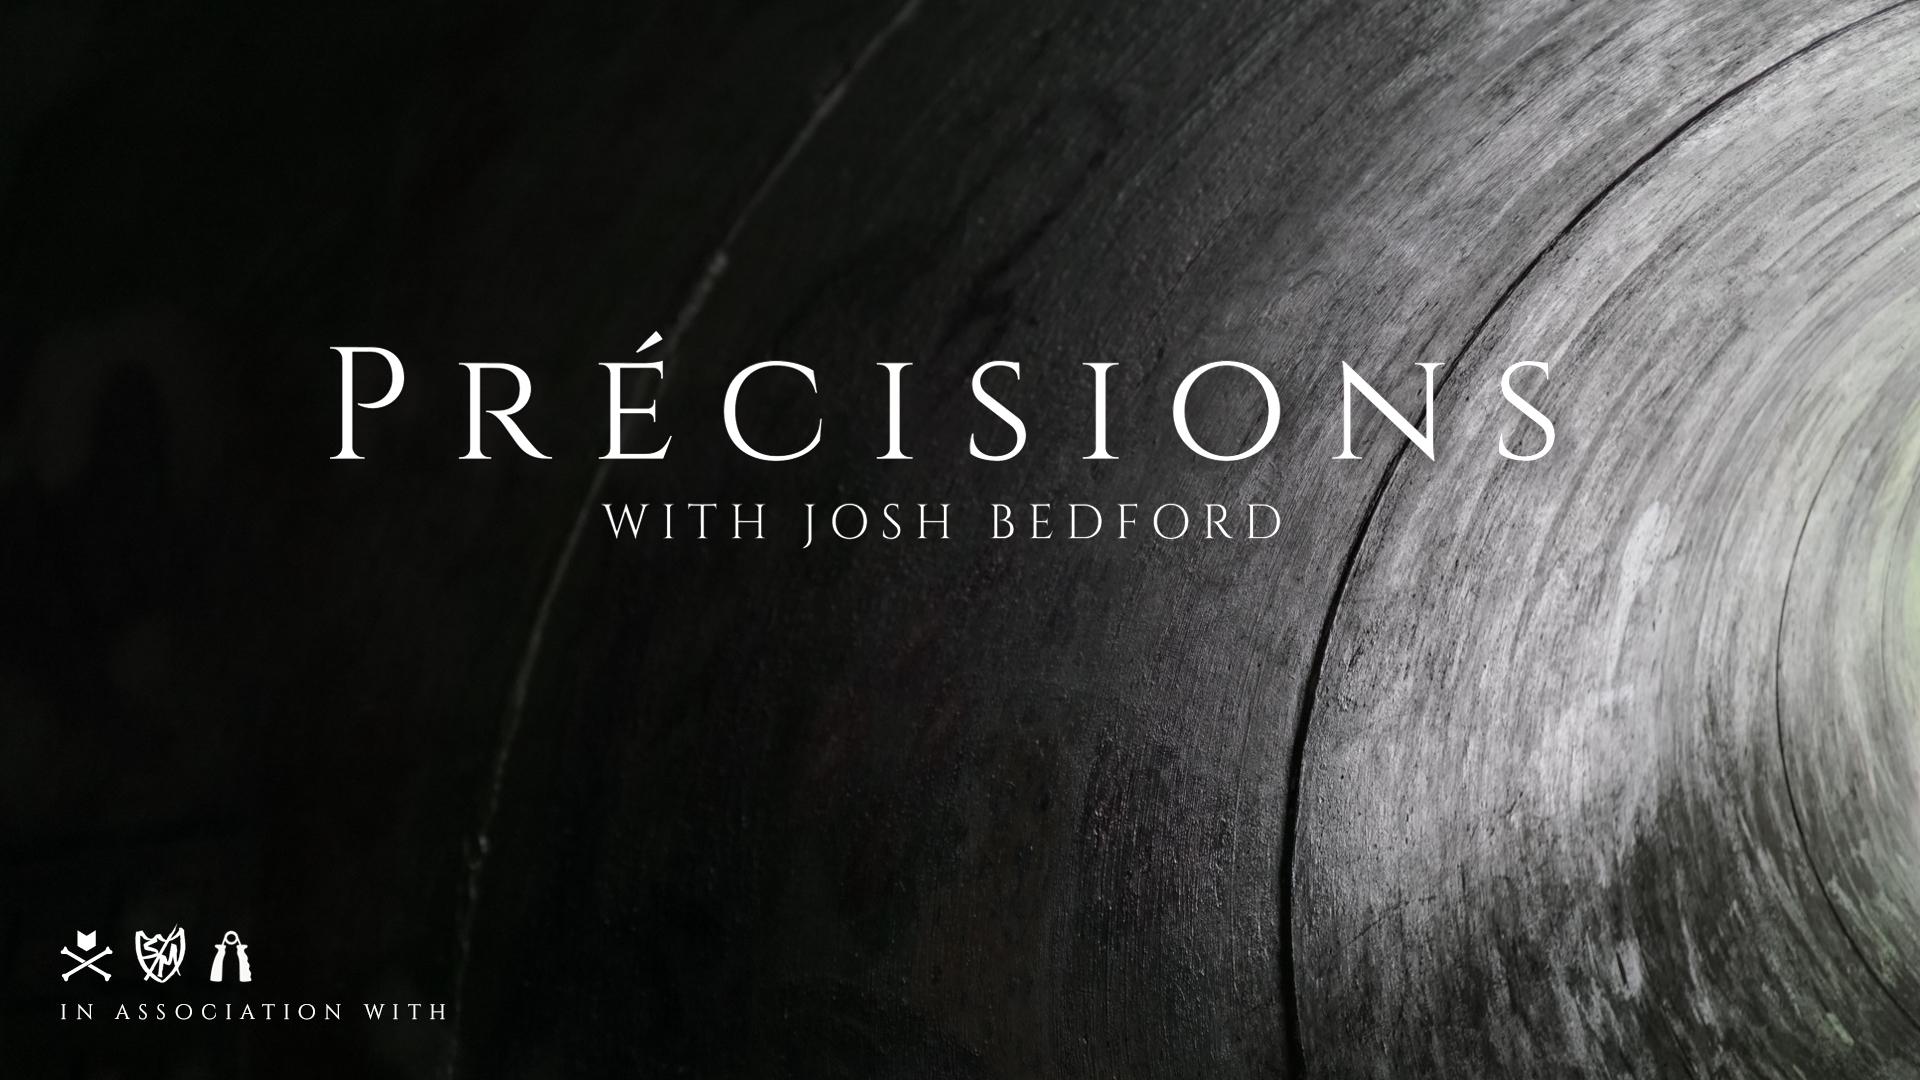 Précisions_Bedford1